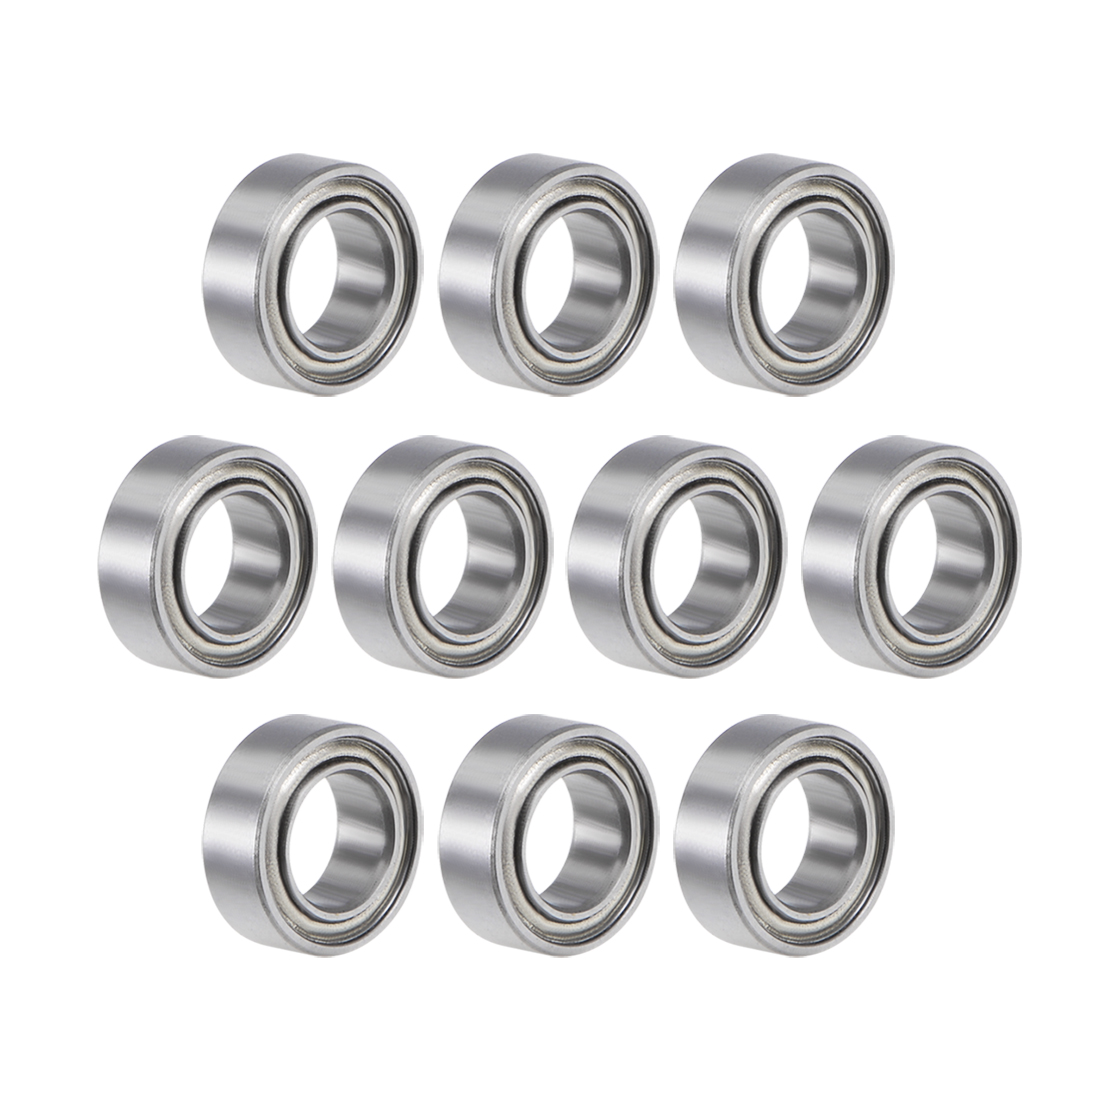 MR74ZZ Ball Bearing 4x7x2.5mm Double Shielded ABEC-3 Bearings 10pcs